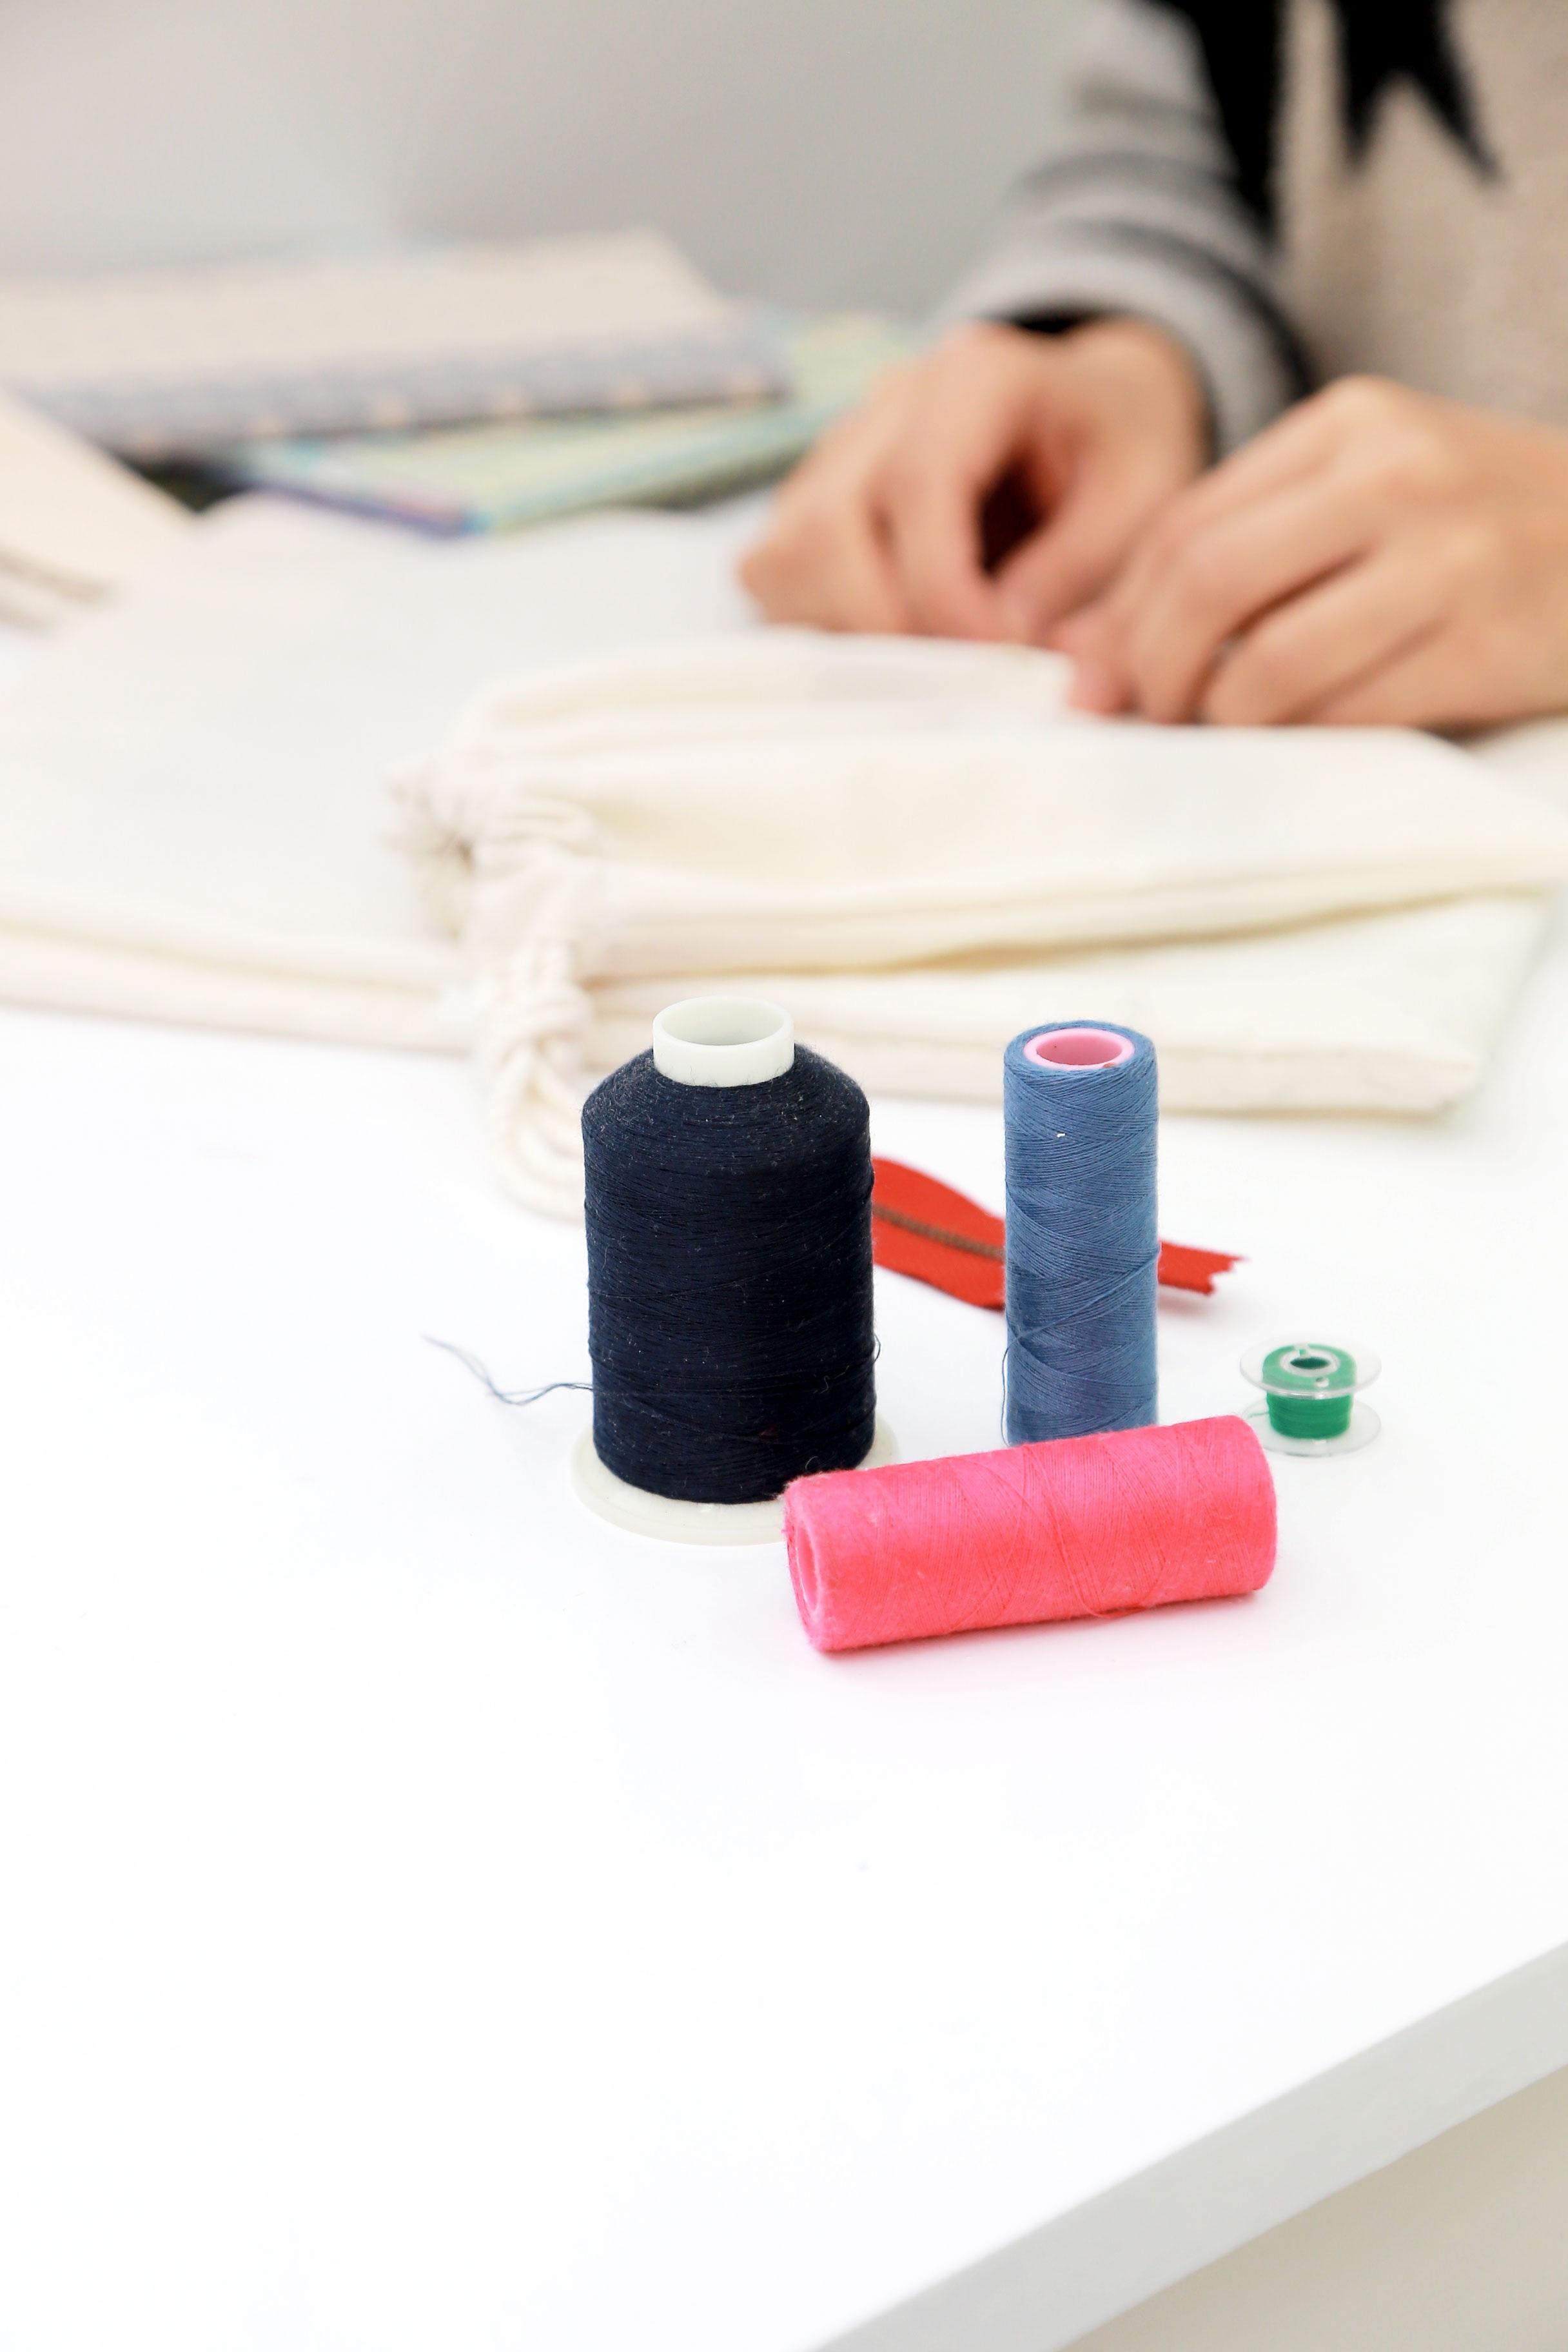 Fotos gratis : material, tela, de coser, máquina de coser, hilo ...